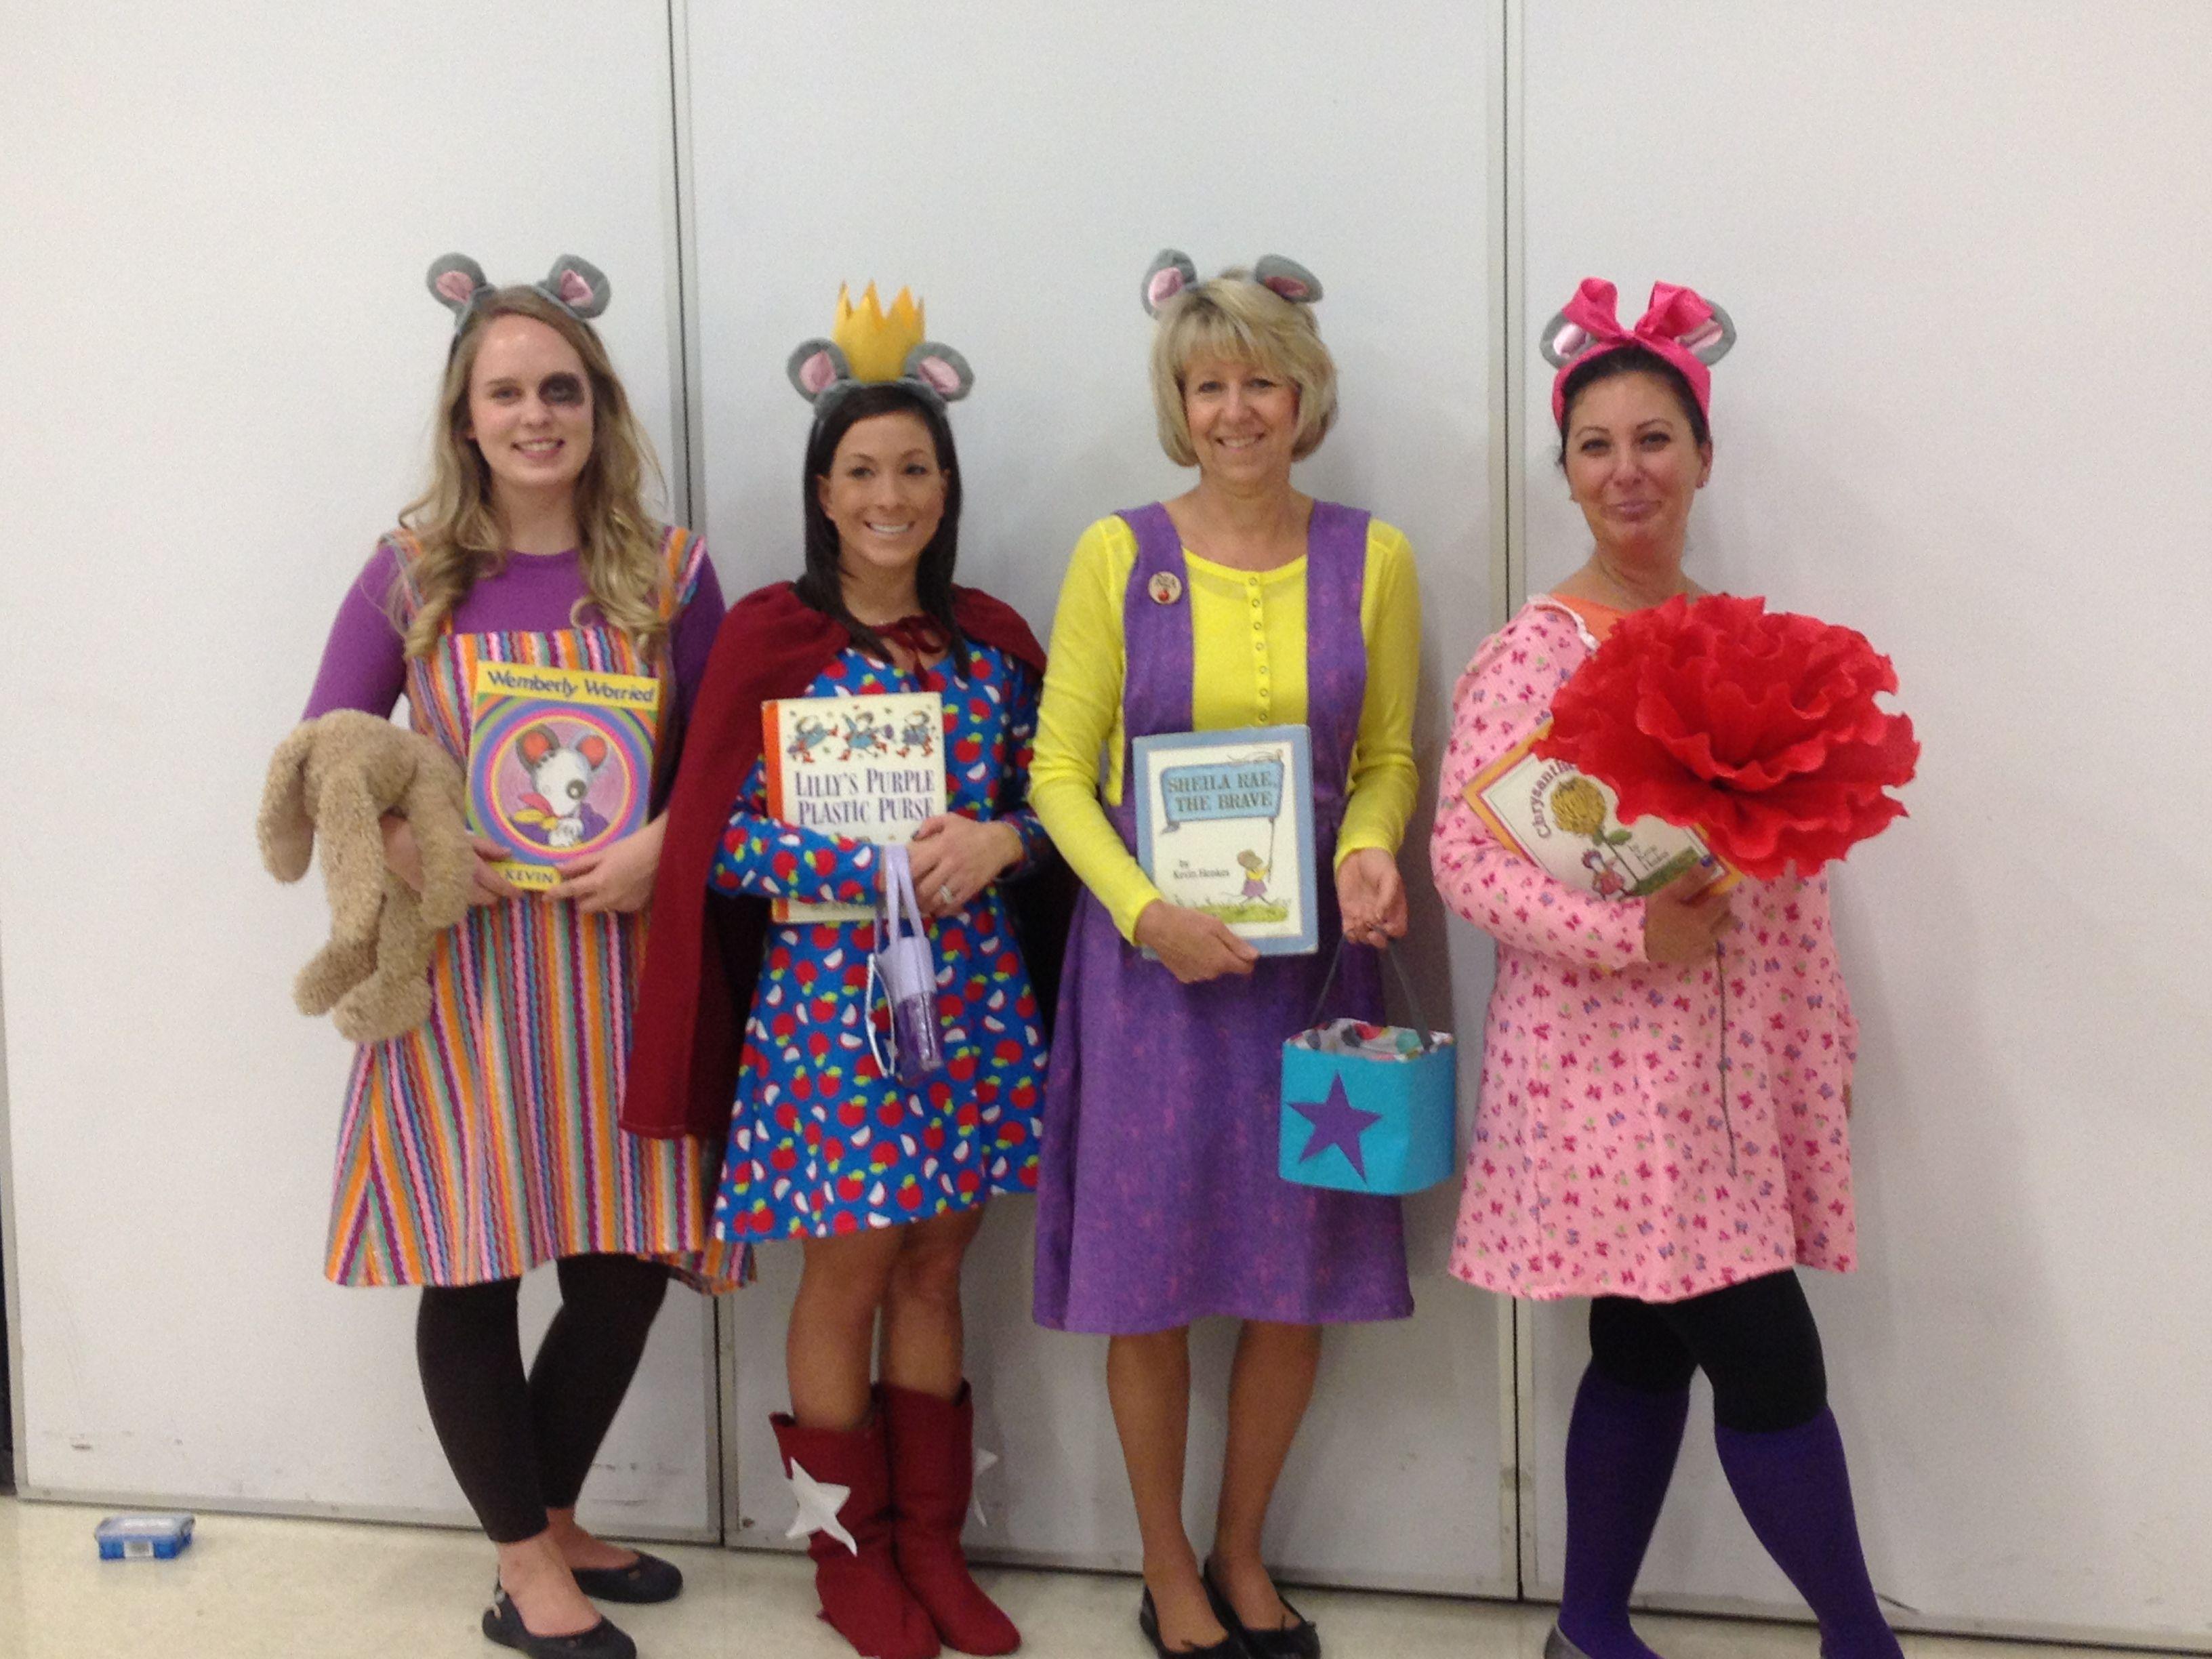 Pin By Megan Gaura On Halloween Rocks Book Character Costumes Teacher Book Character Costumes Character Costumes